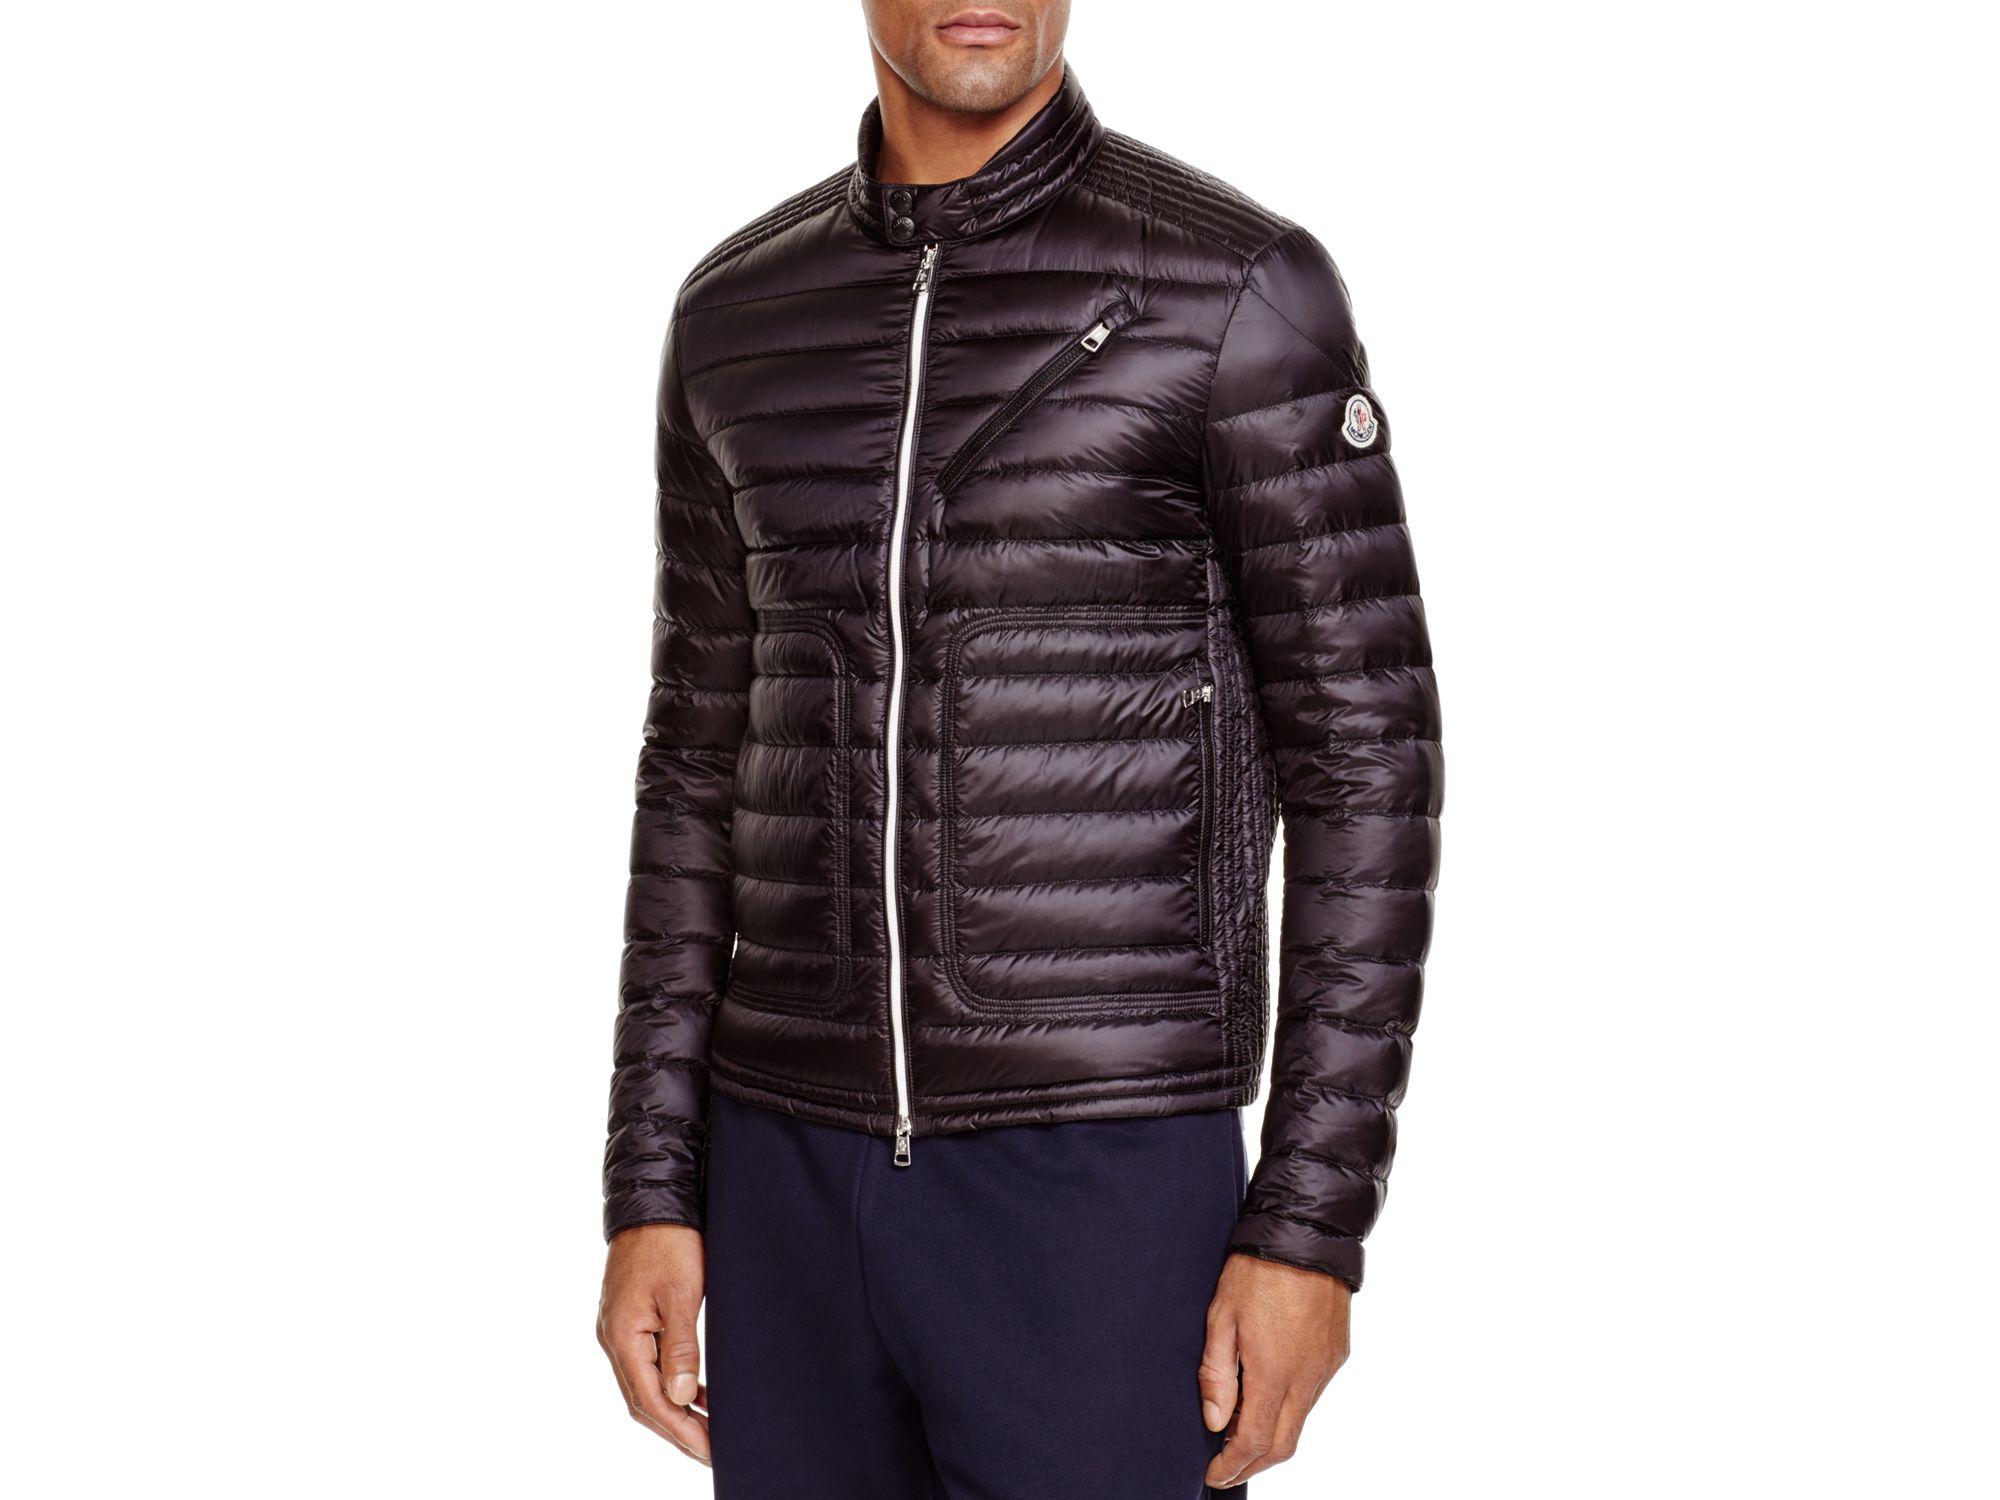 41771040a Lyst - Moncler Picard Moto Down Jacket in Black for Men